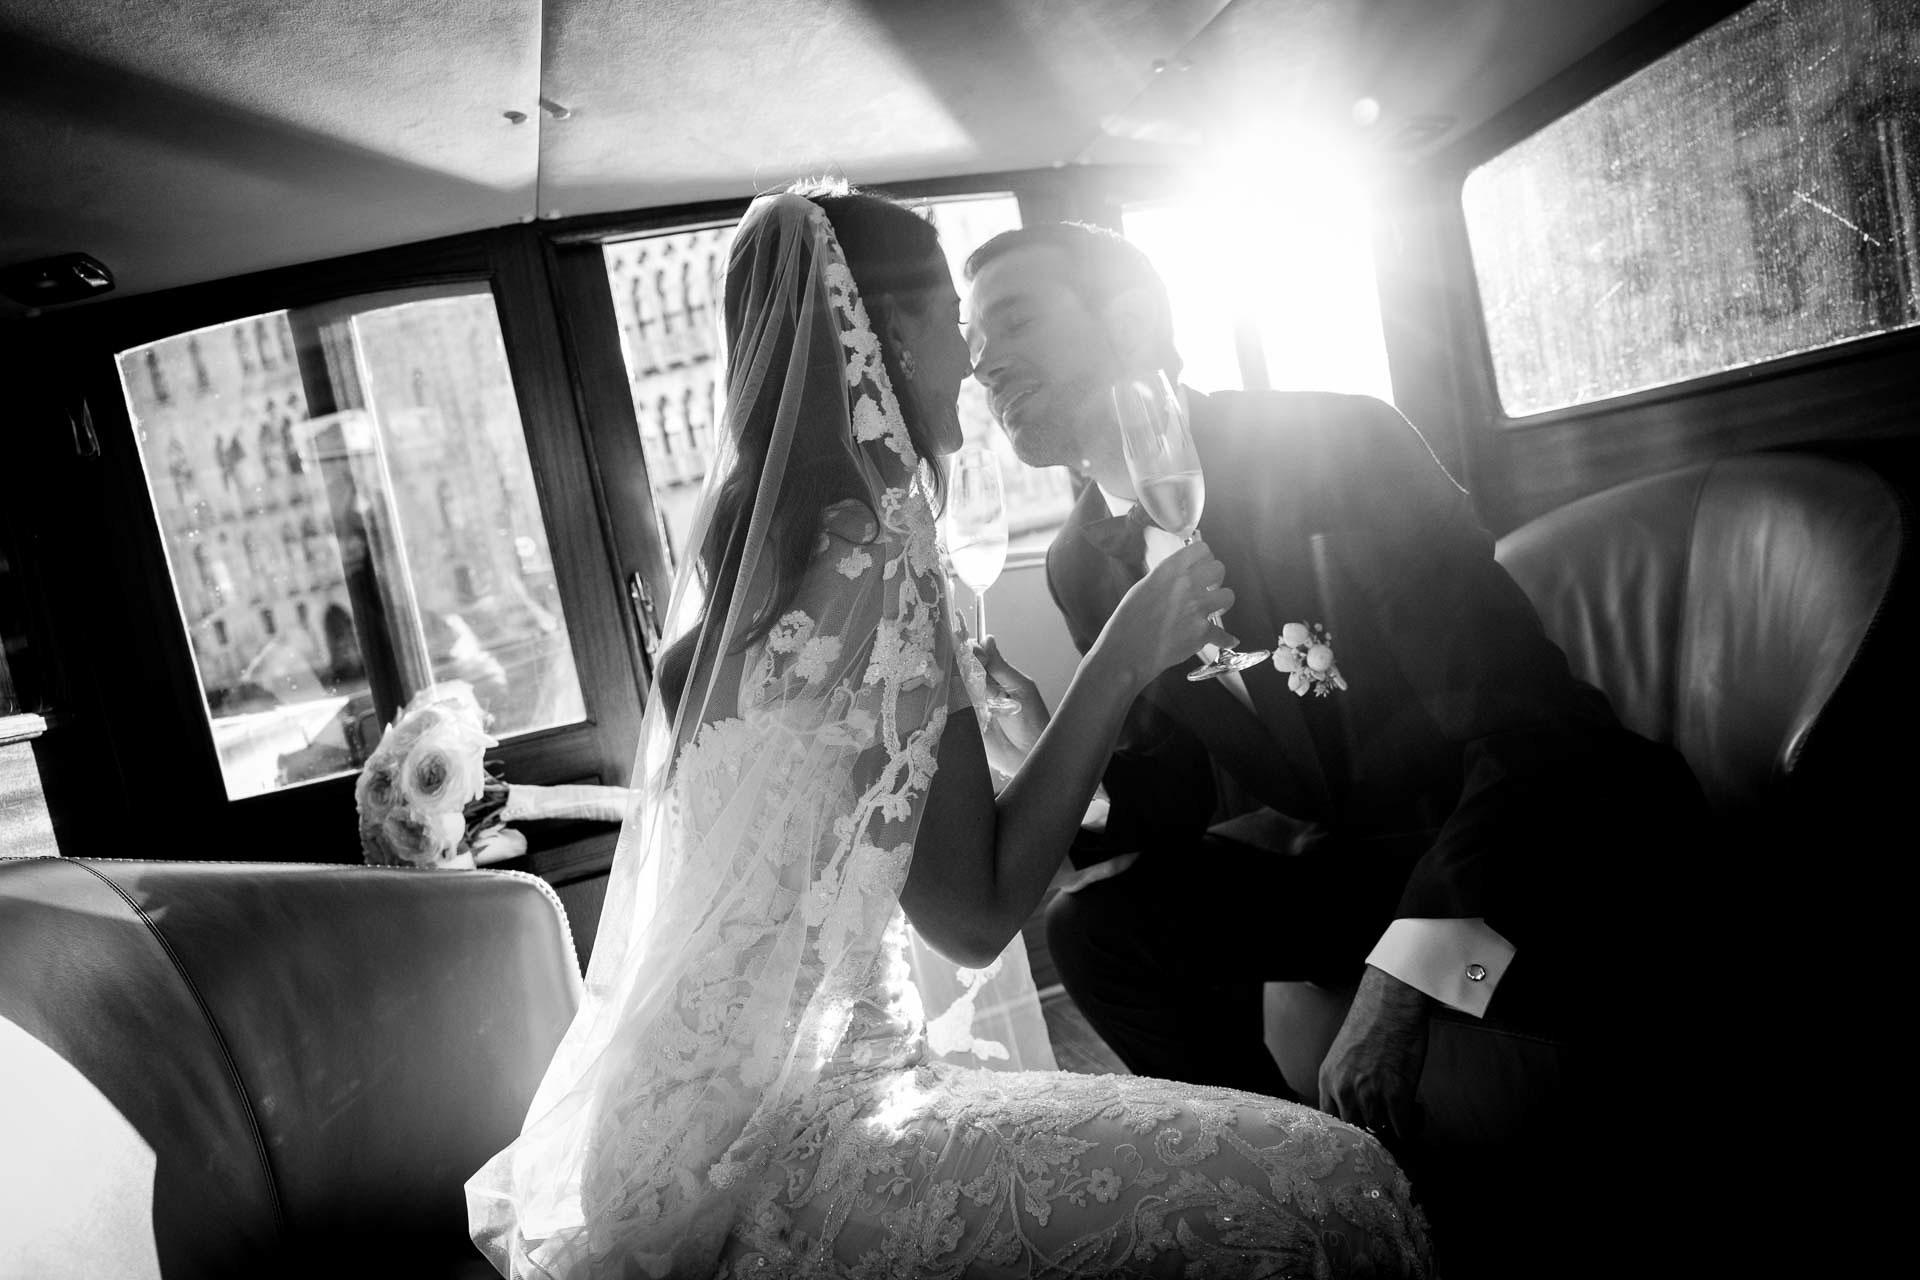 jewish weddings in italy venezia